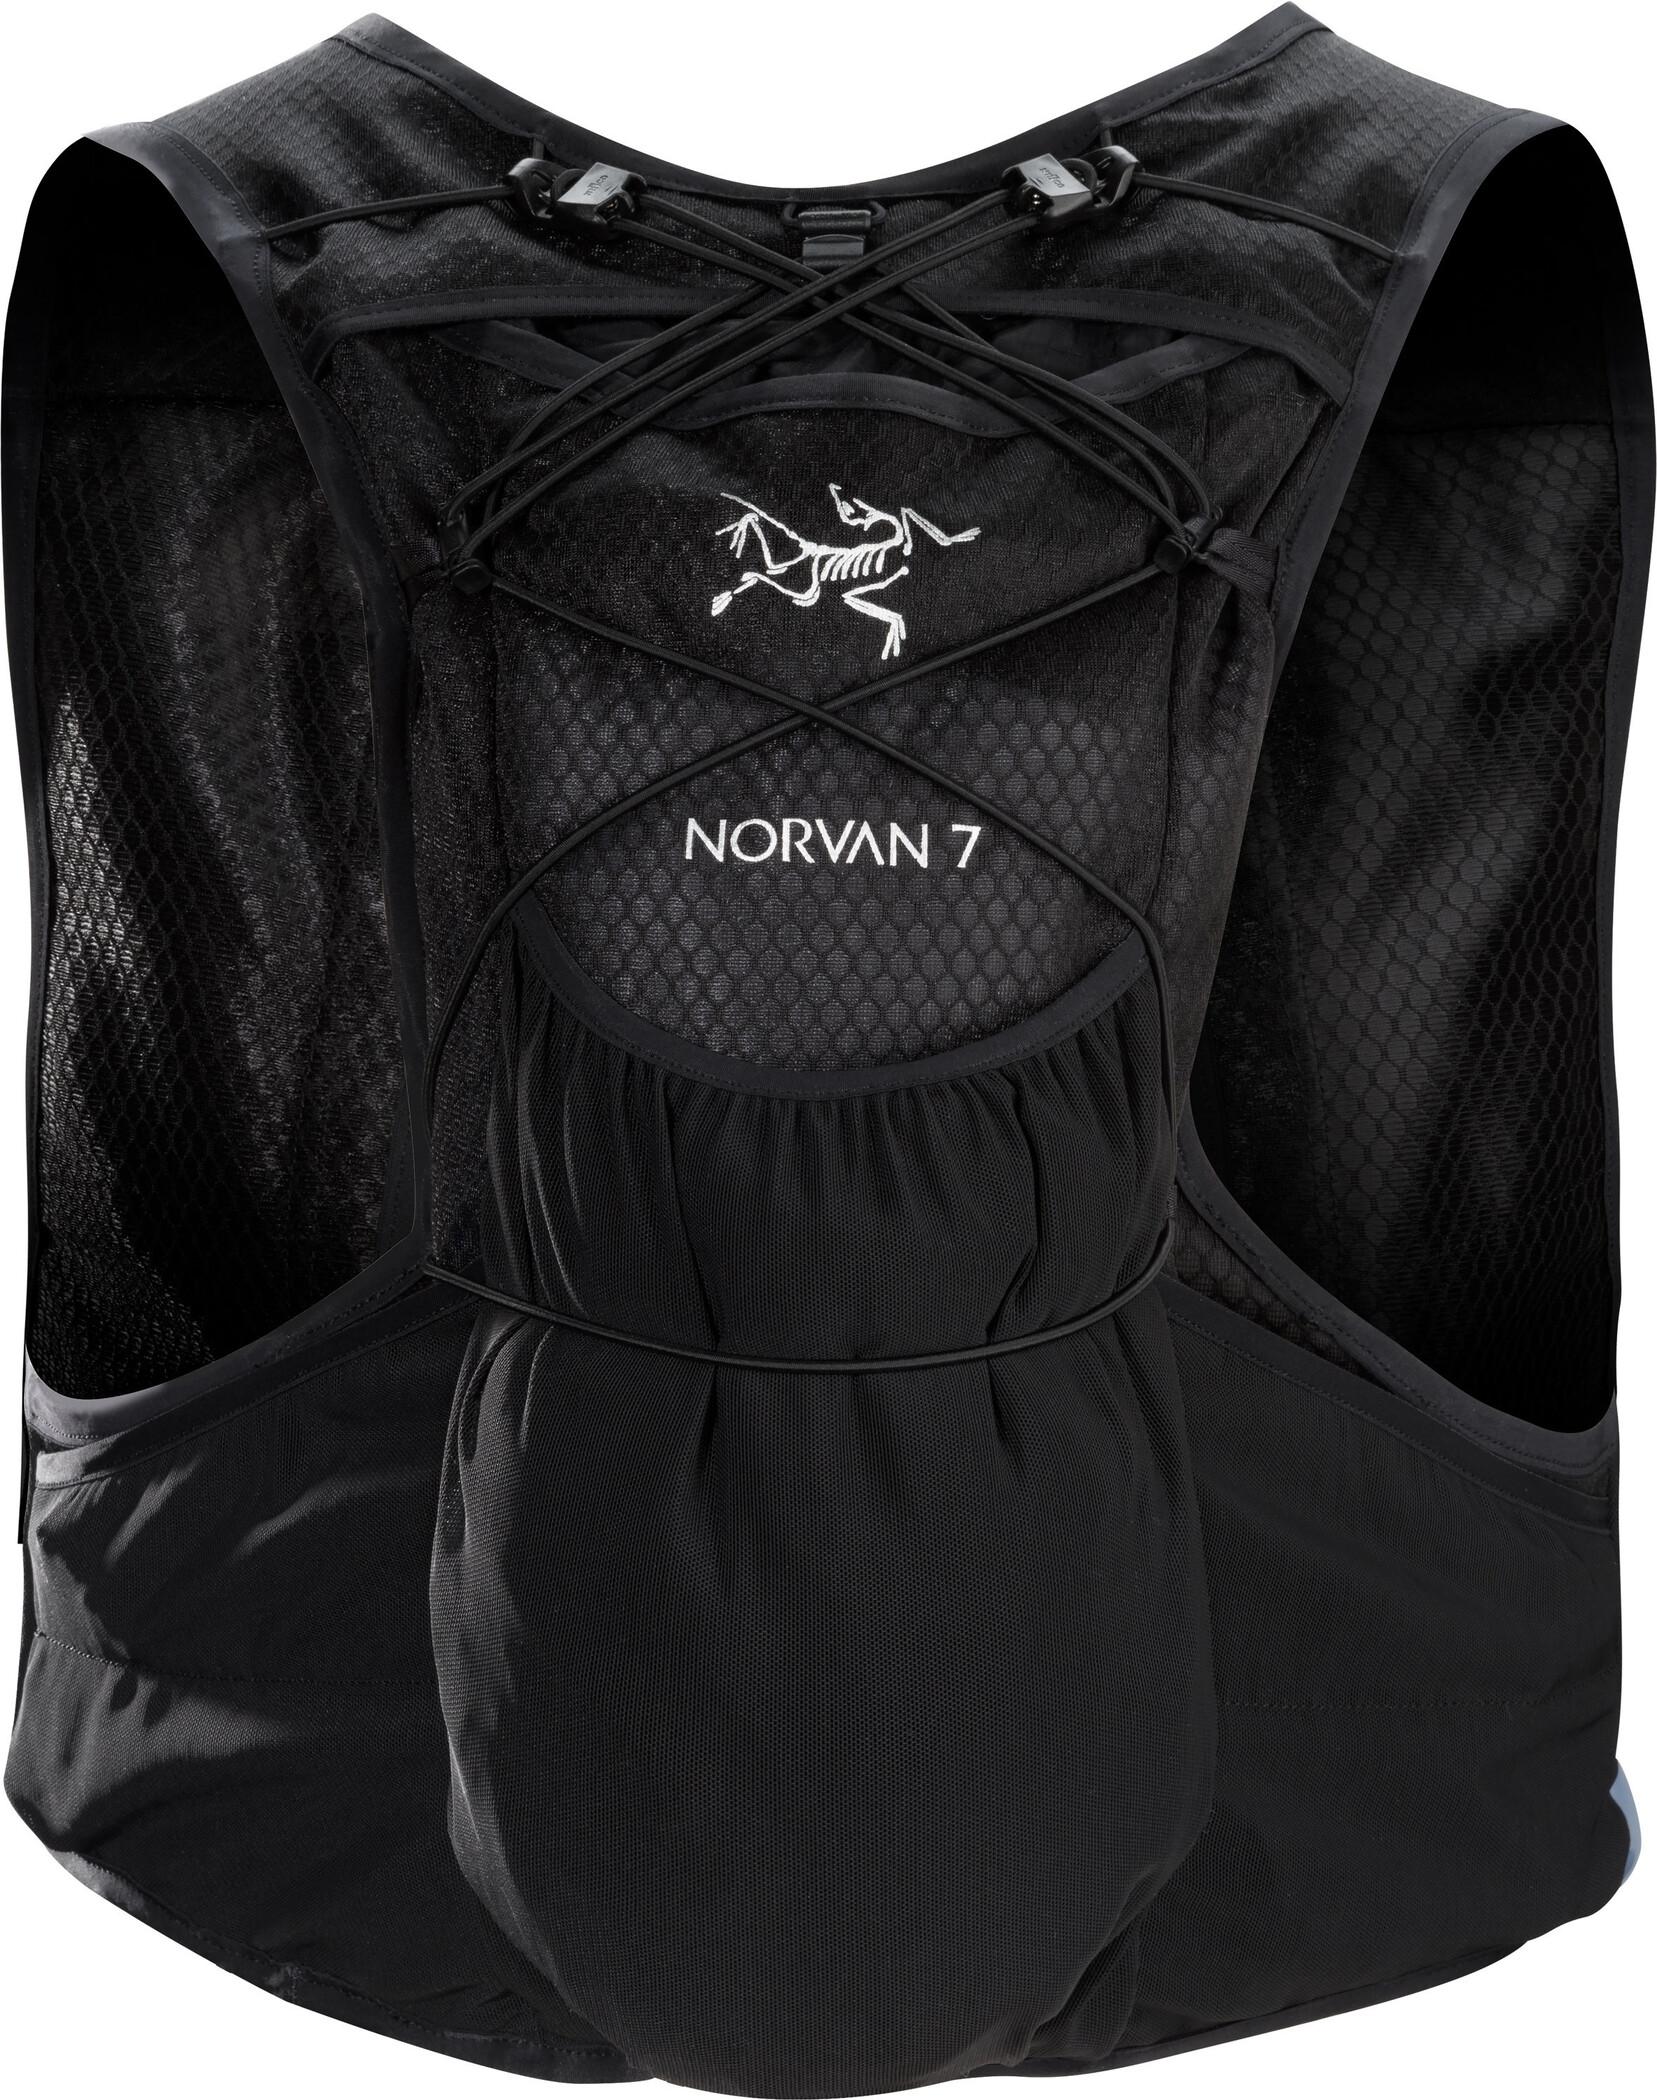 Arc'teryx Norvan 7 Løberygsæk, black (2019)   Travel bags